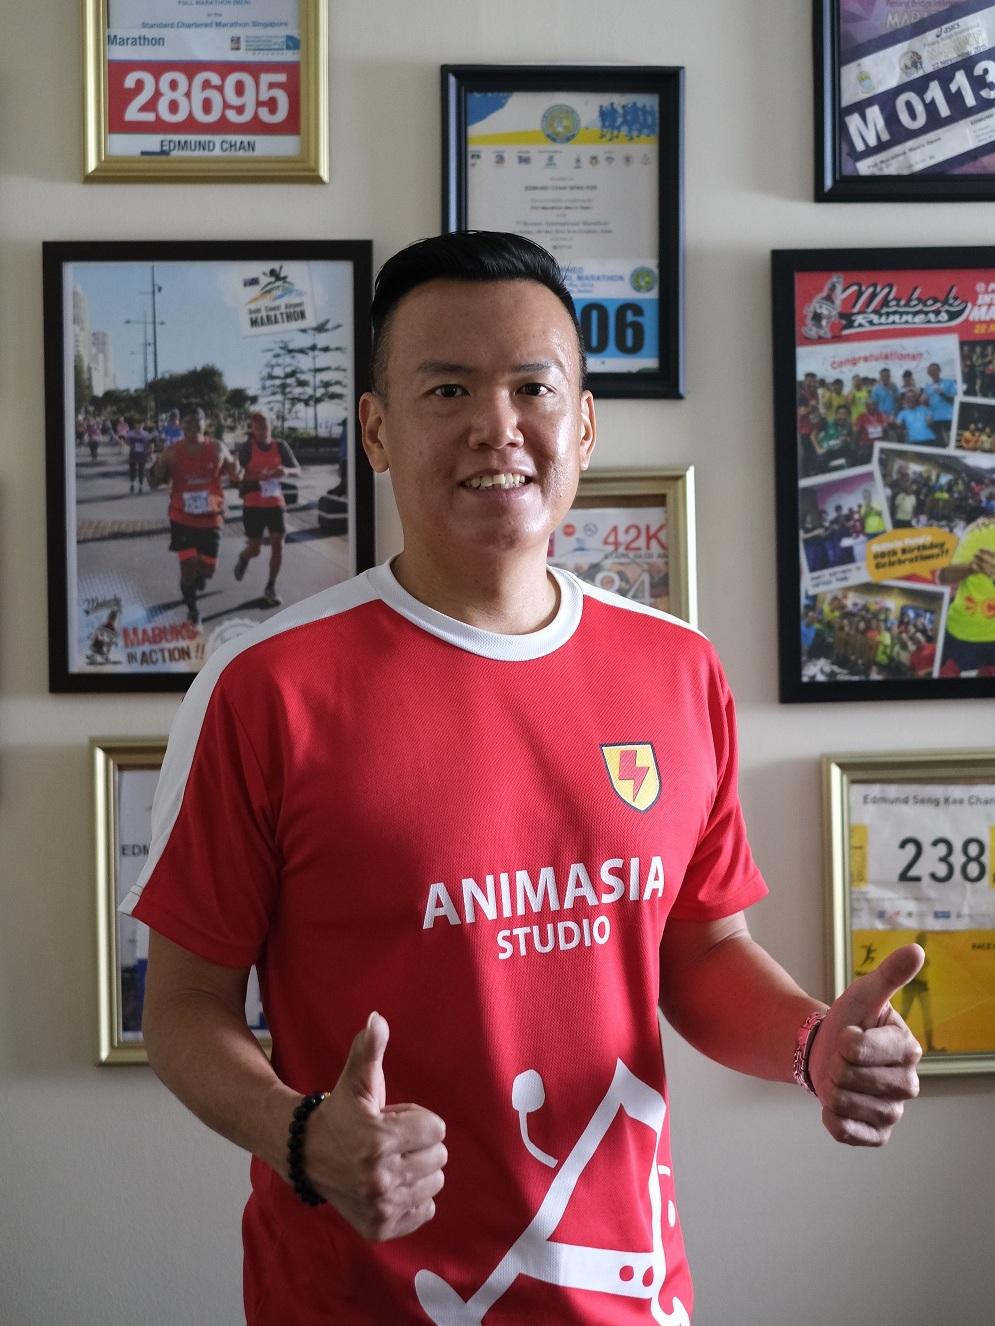 Animasia Studio's Managing Director, Edmund Chan. ― Picture courtesy of Animasia Studio